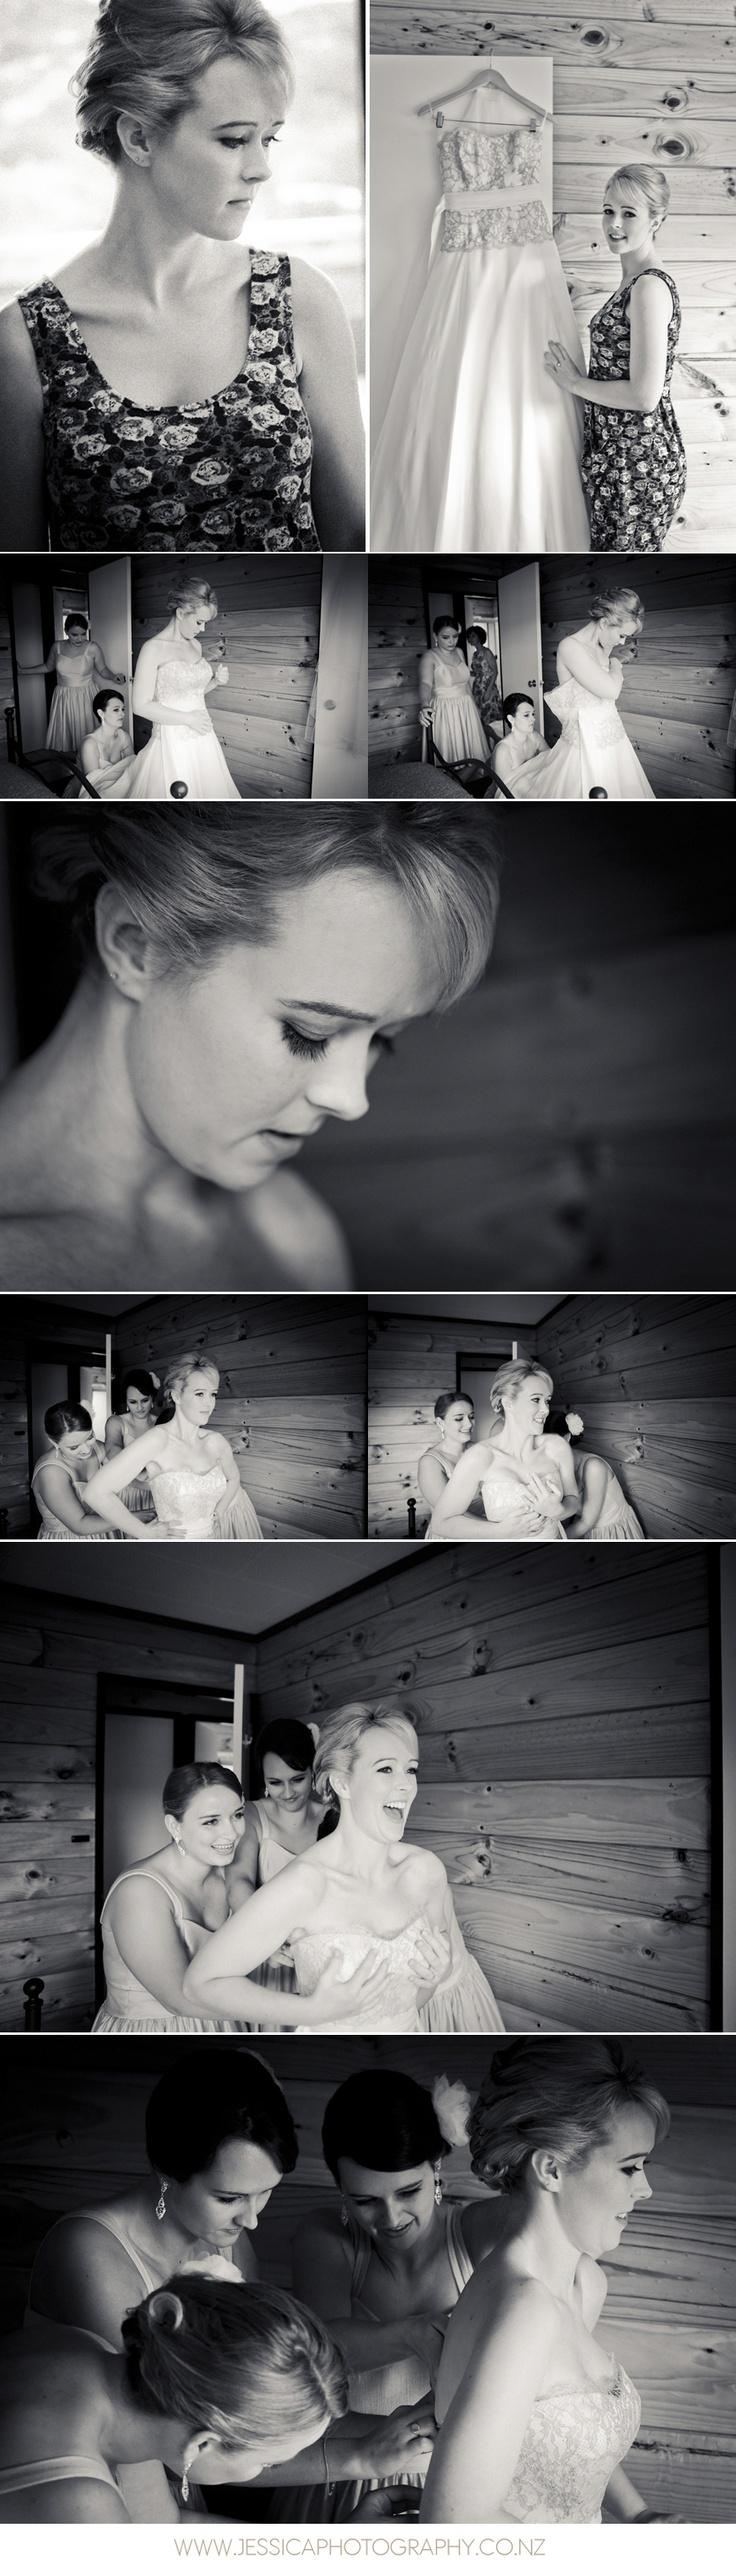 Jessica Auckland Wedding Photographer Waiheke Mudbrick_004